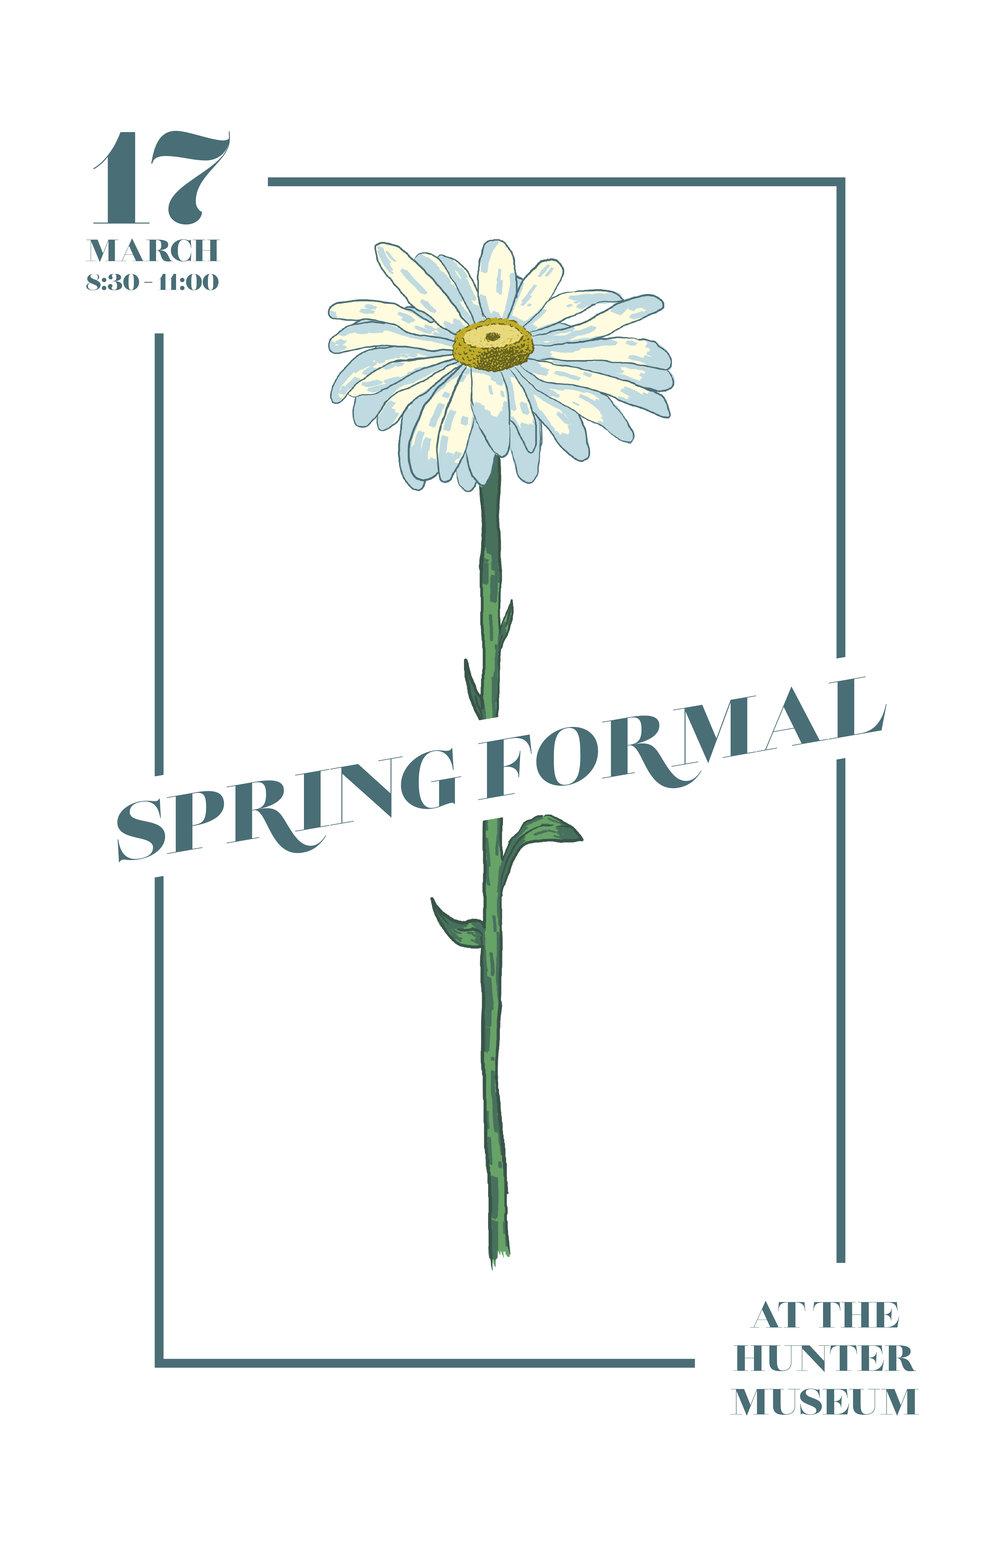 Spring Formal Poster_Image-01.jpg